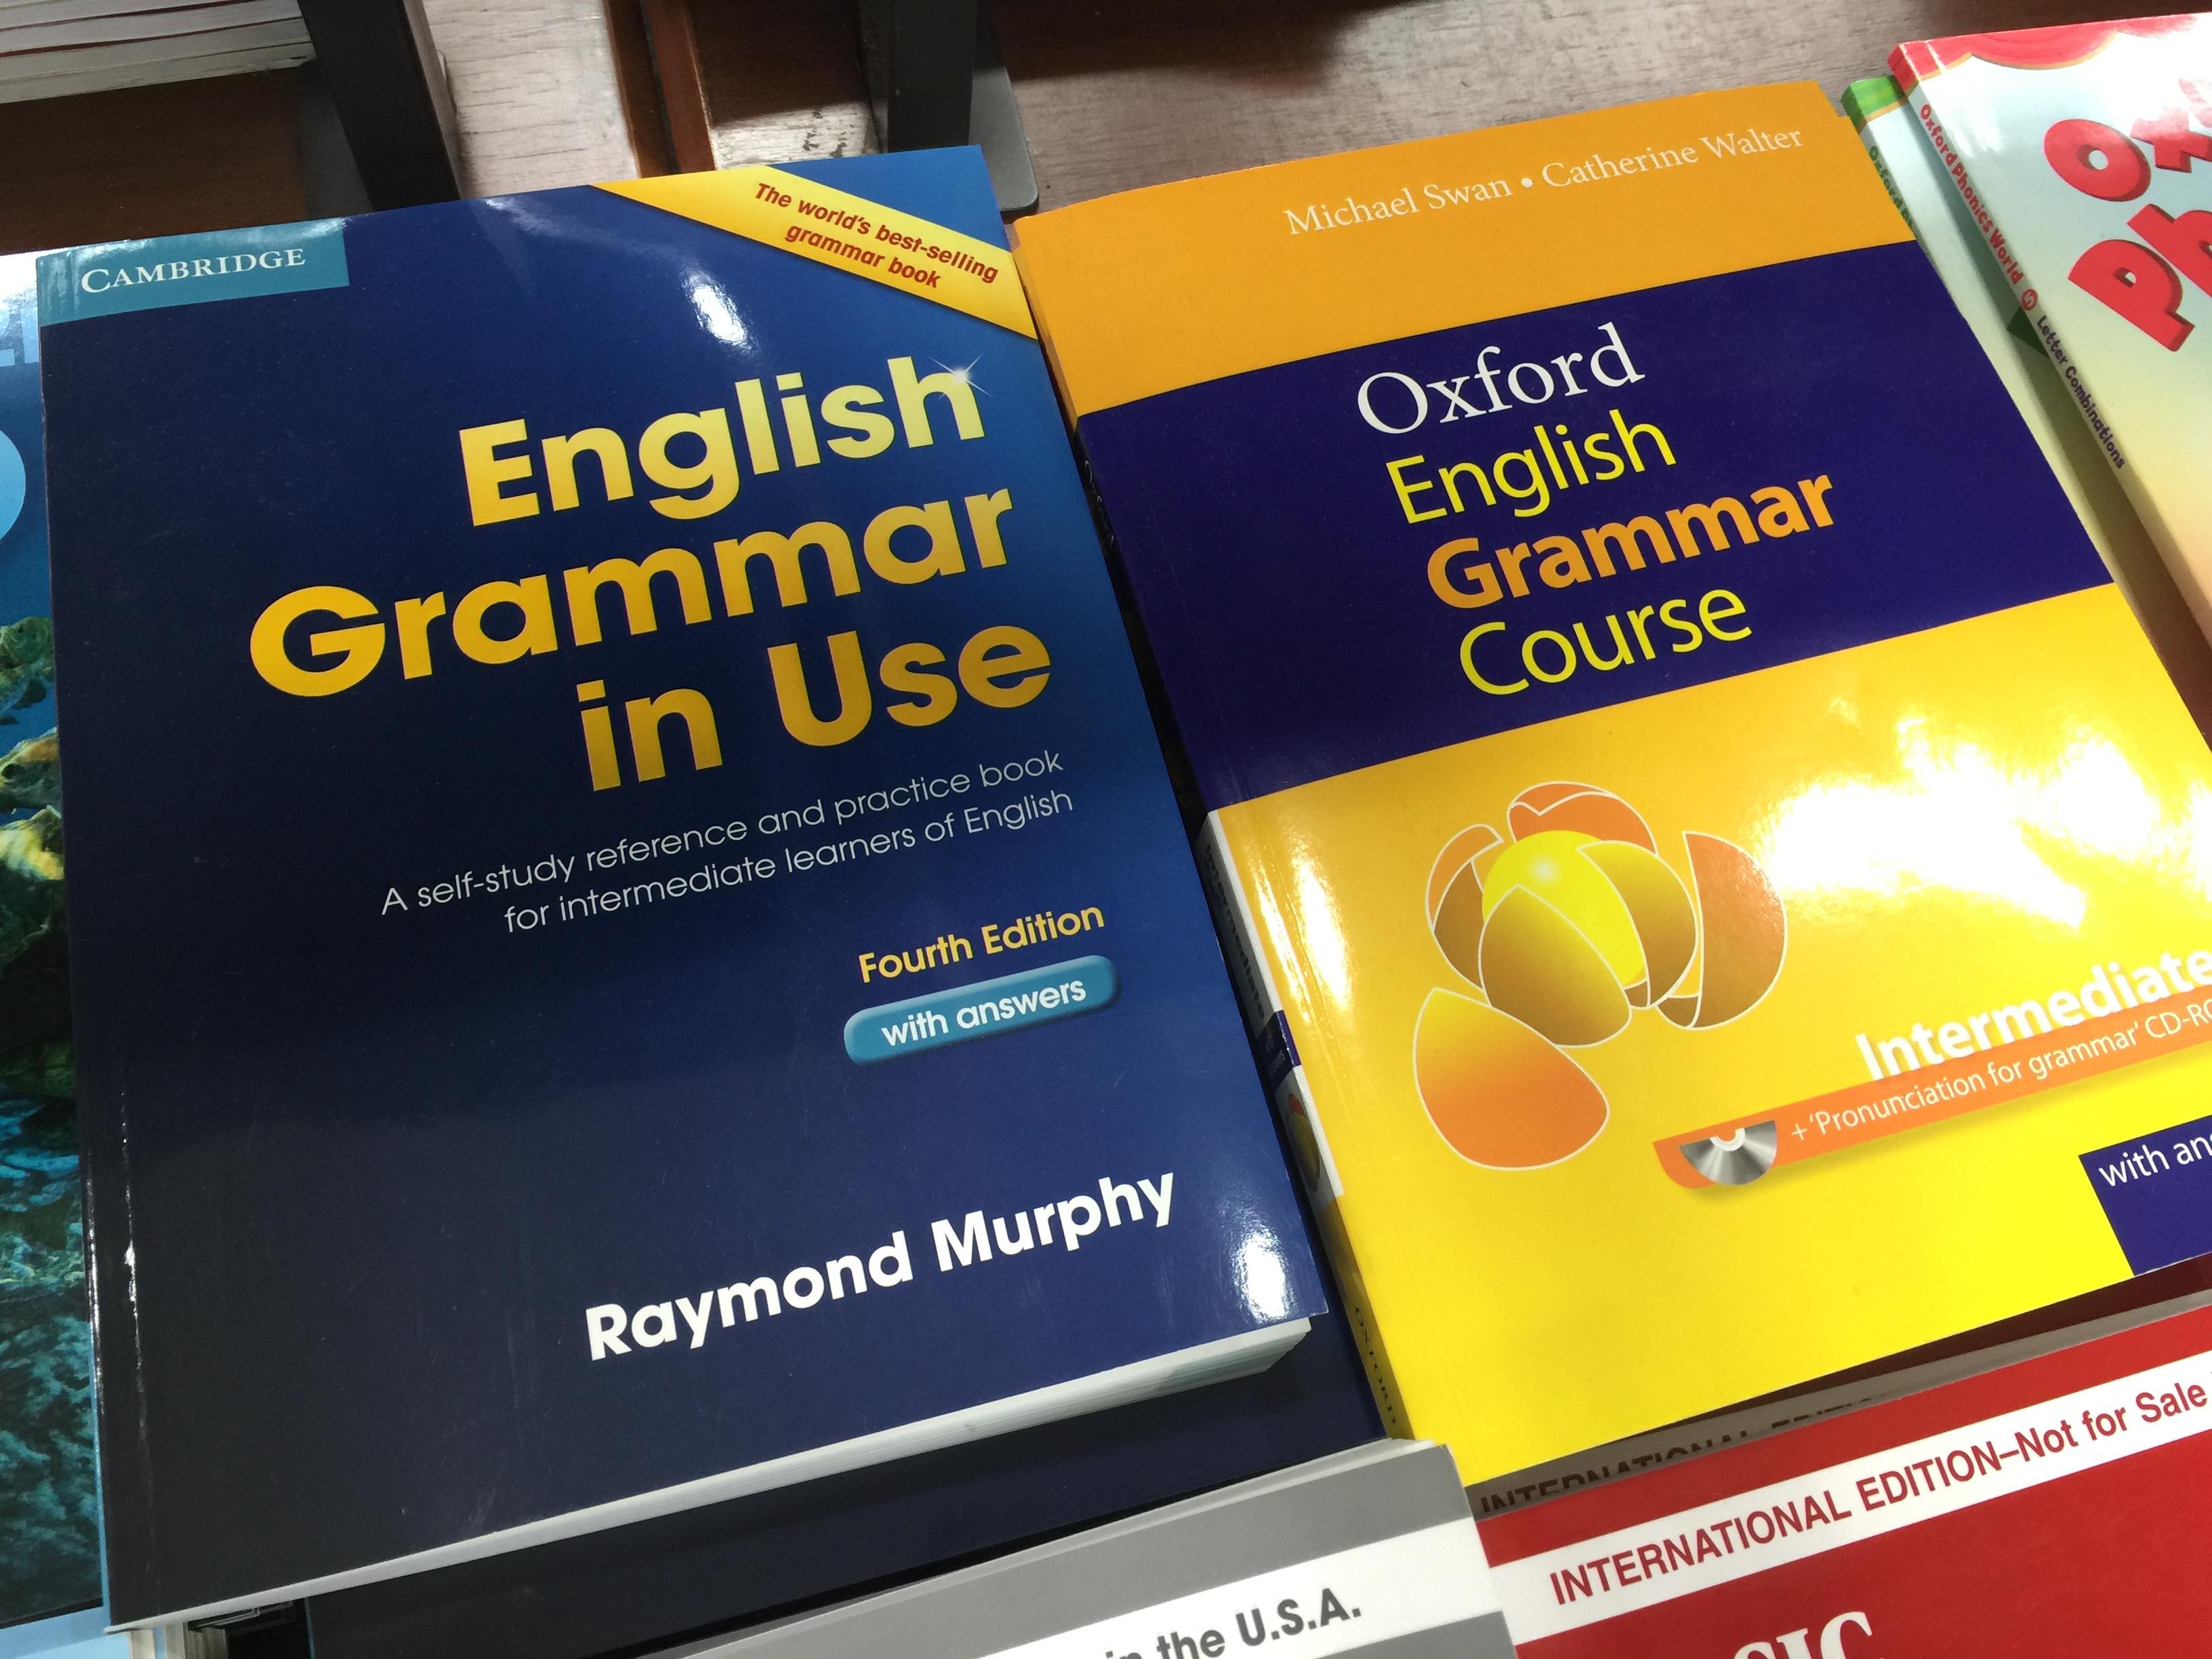 English Grammar in Use 4th 화이팅!!